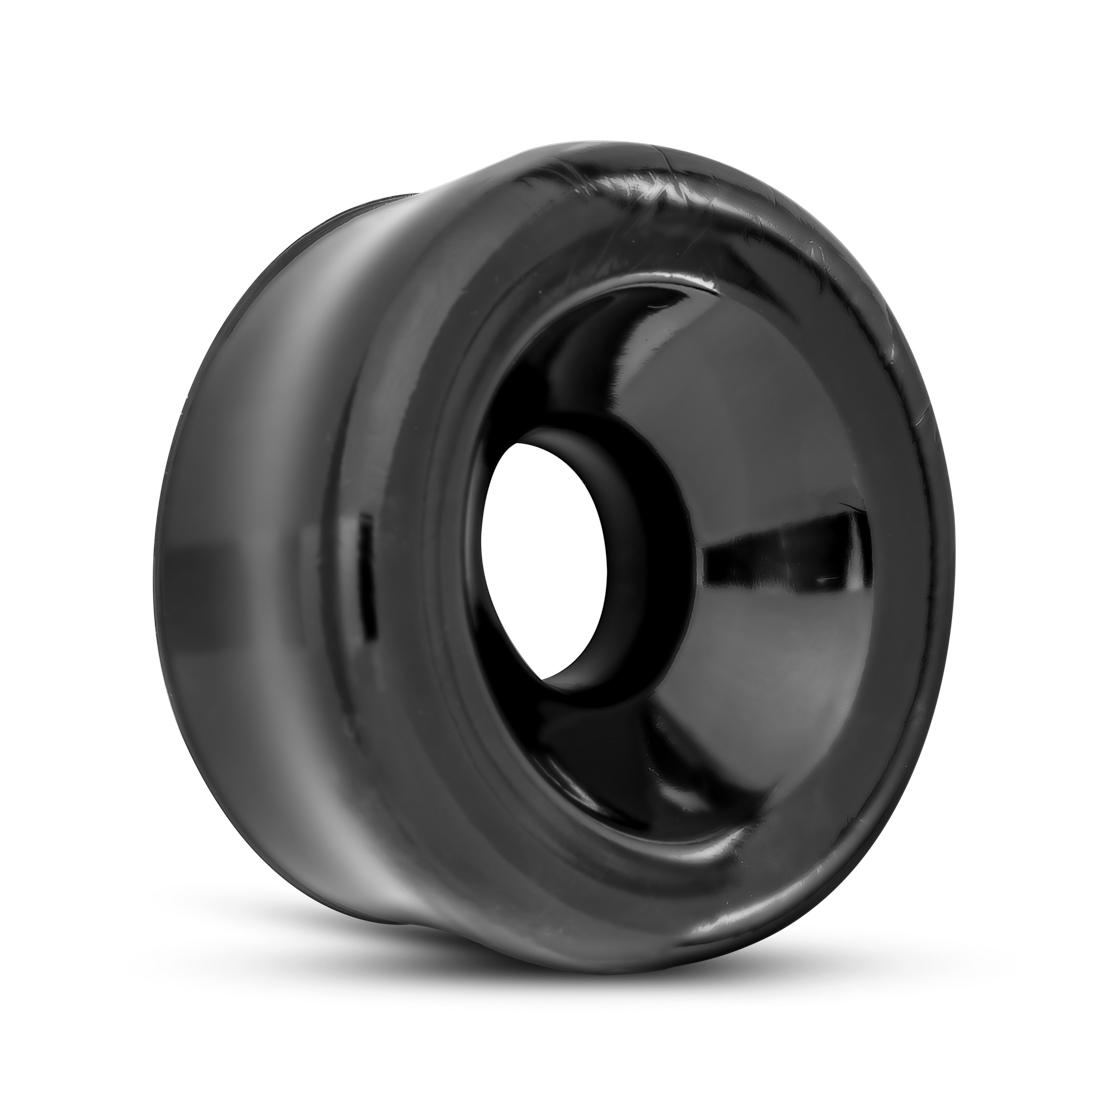 Performance - Universal Replacement TPE Pump Sleeve - Black